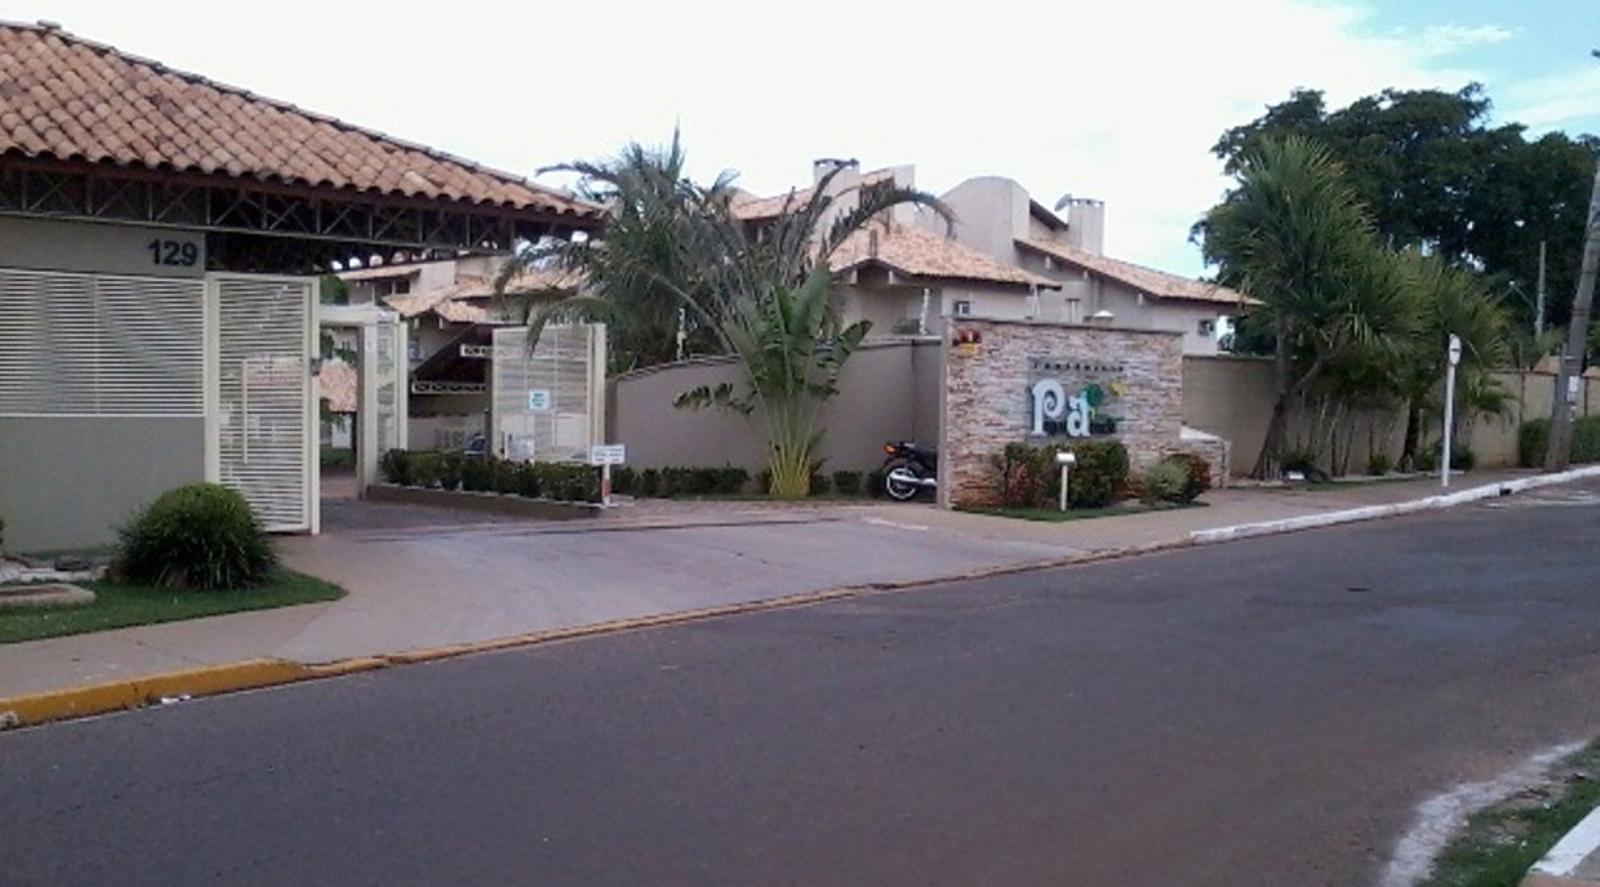 venda-campo-grande-ms-apartamento-rua-gardenia-cidade-jardim-perez-imoveis